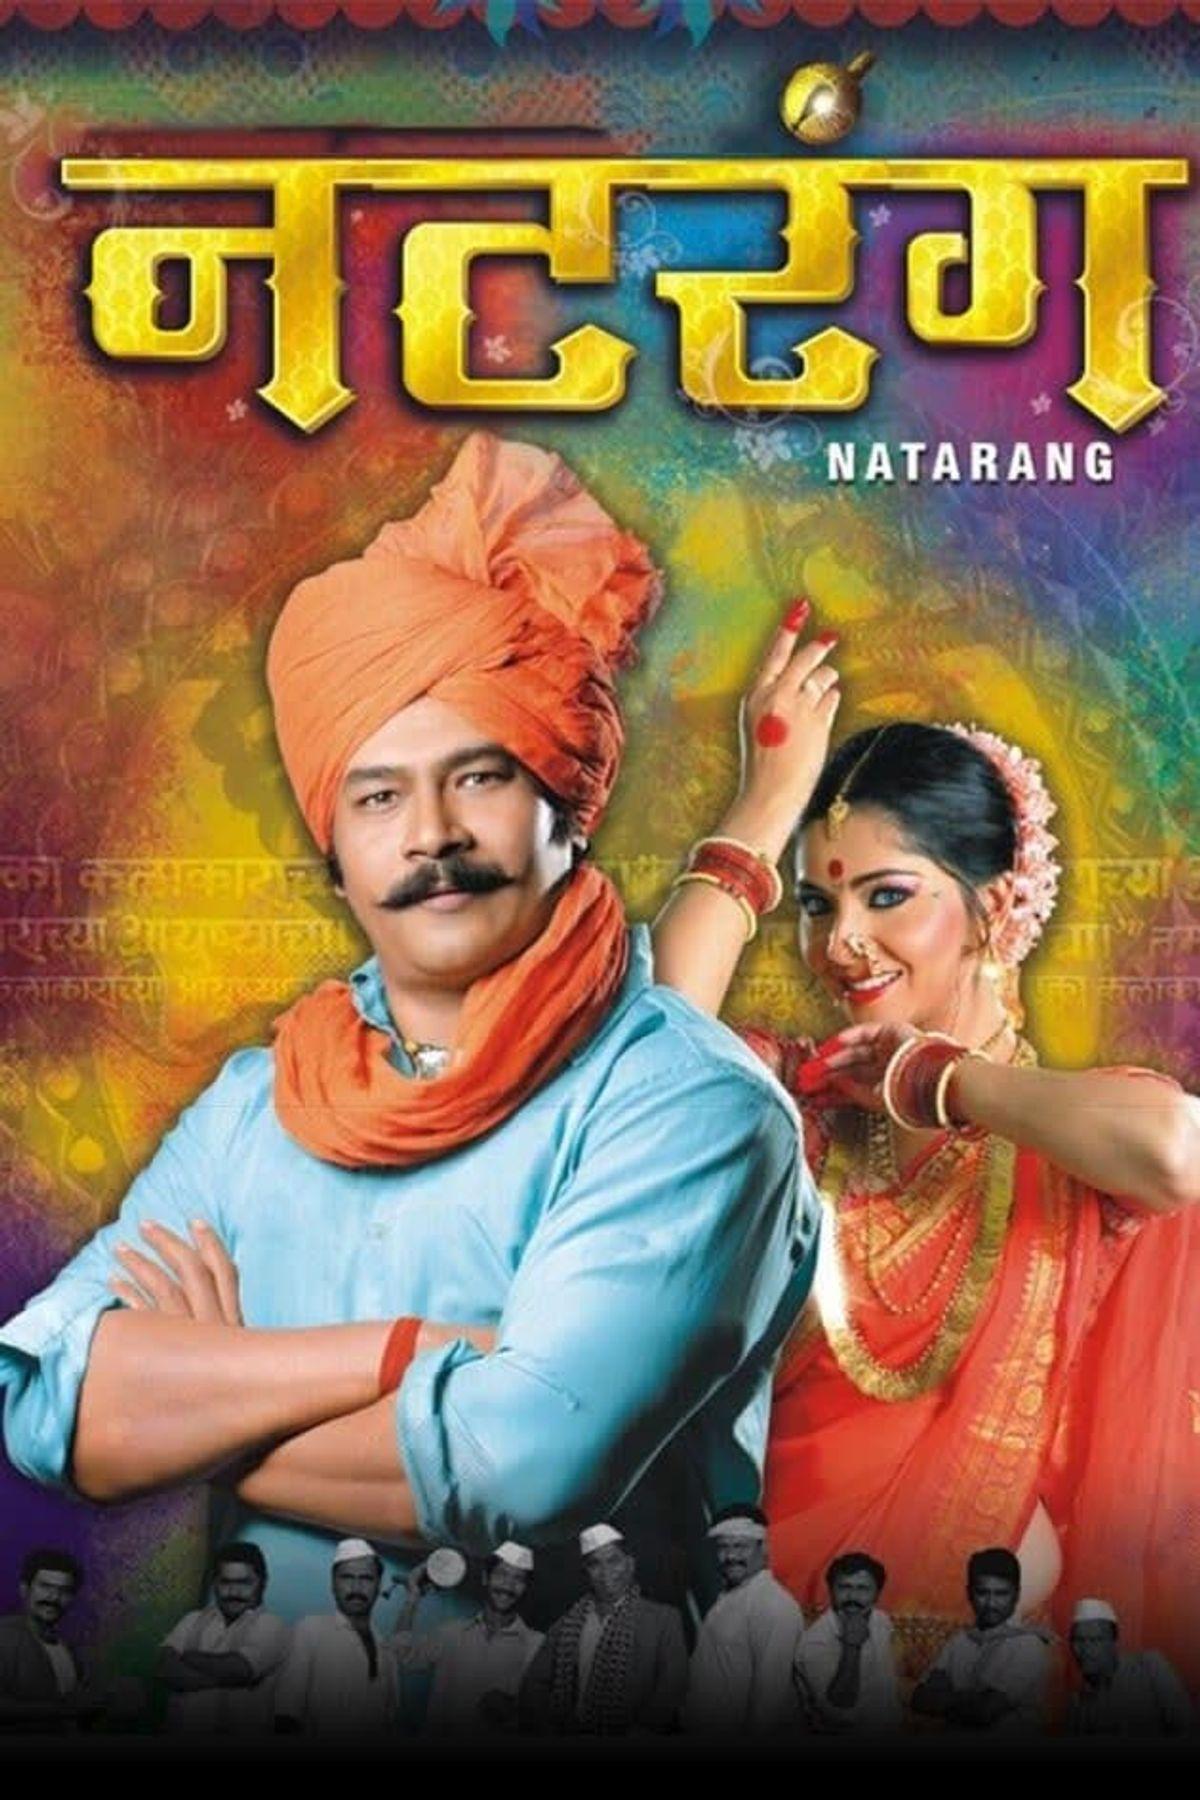 Ravi Jadhav Best Movies, TV Shows and Web Series List